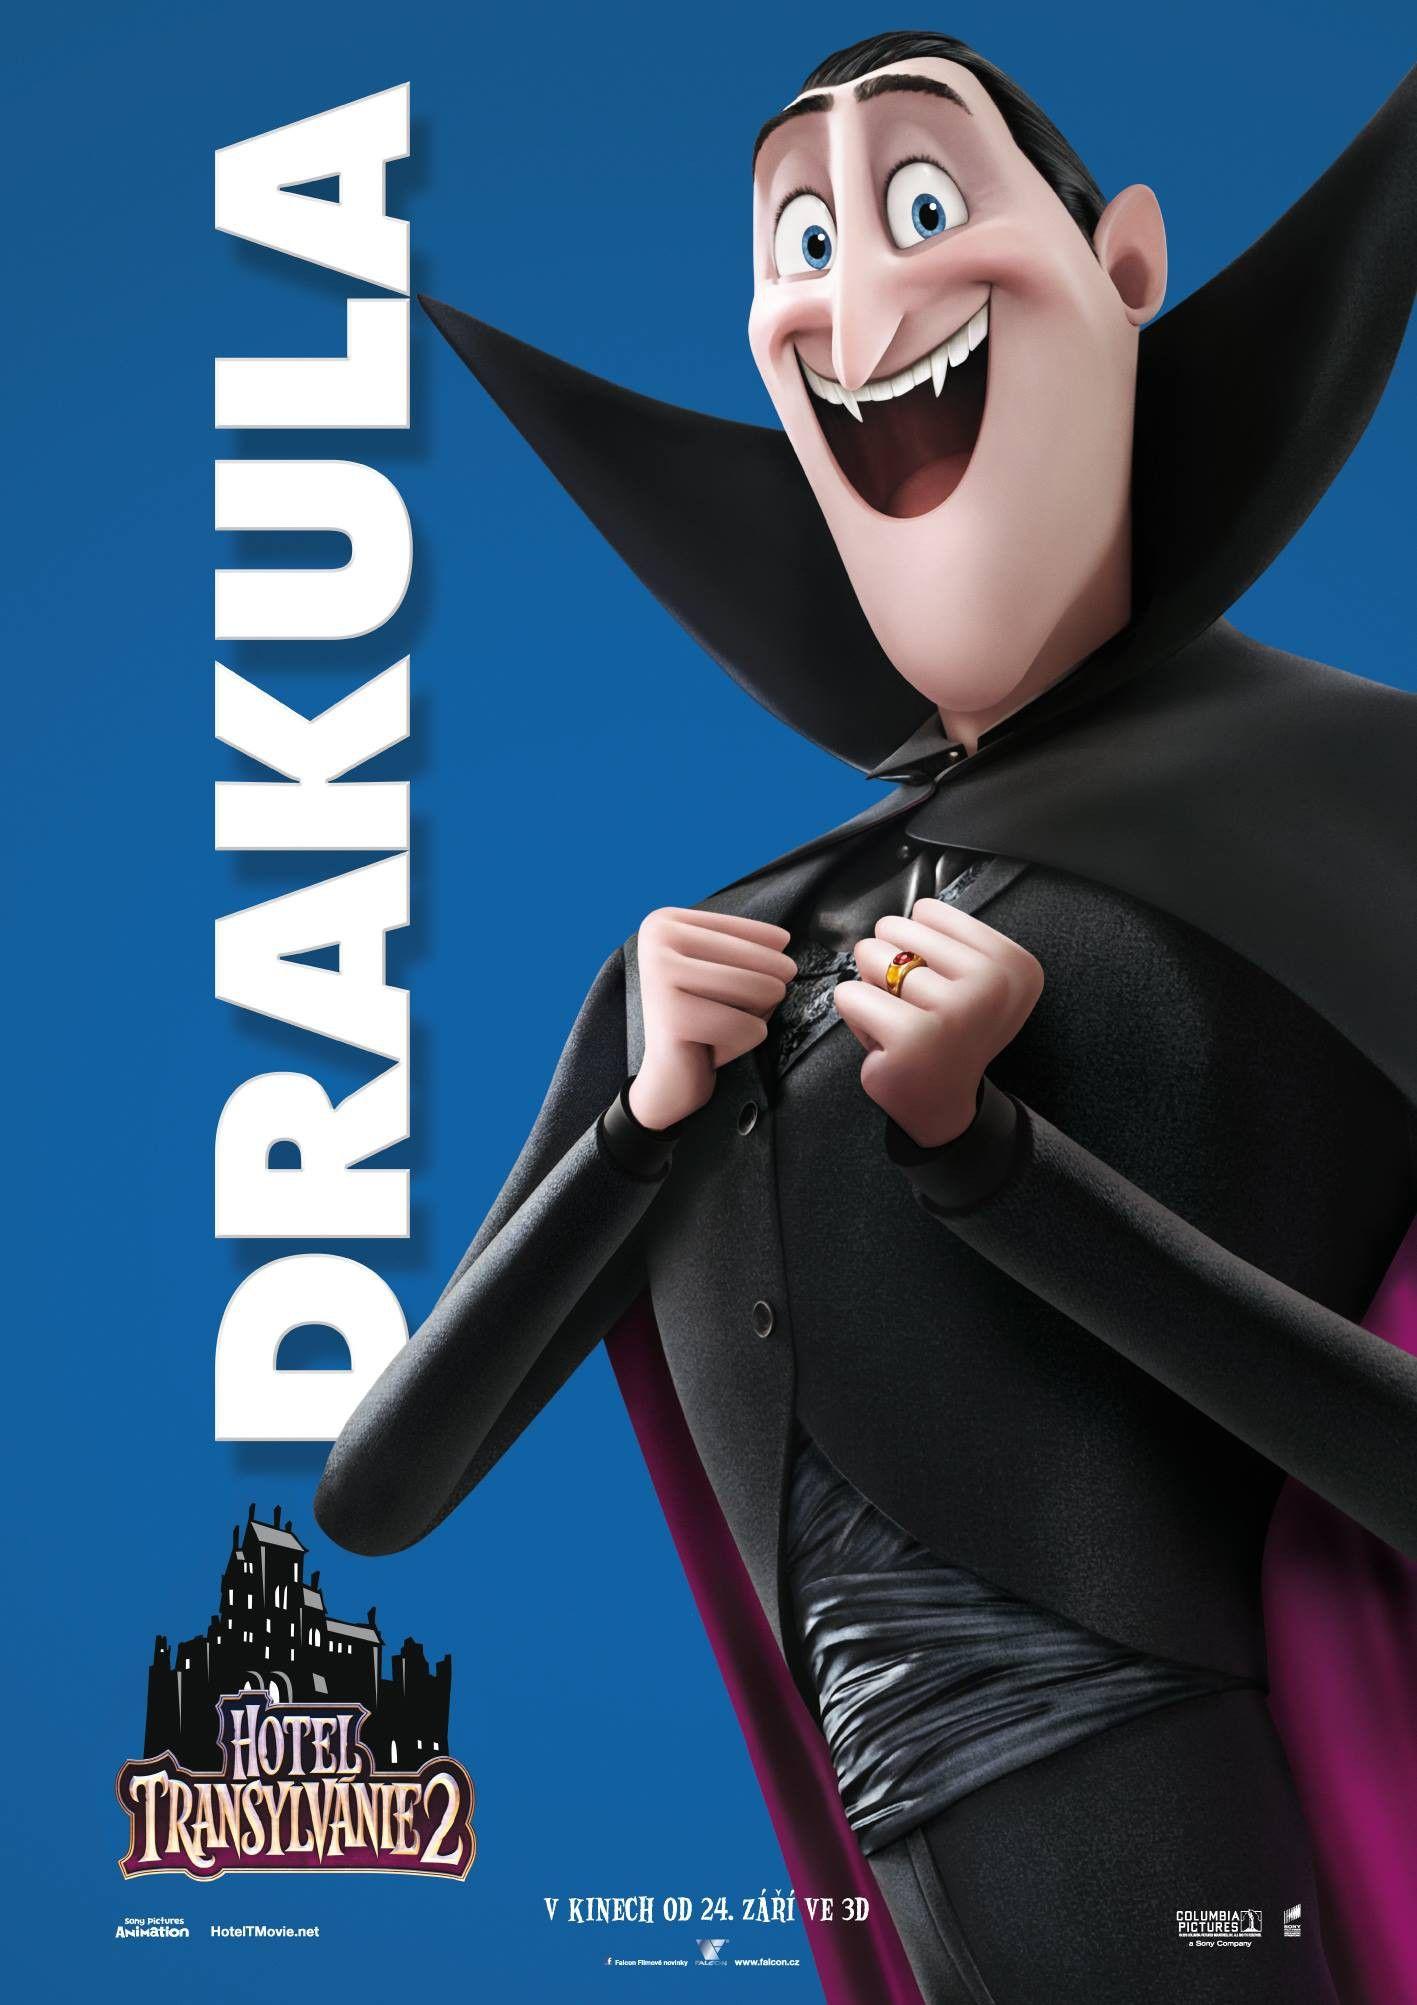 Hotel Transylvania 2 Individual Posters Tags Dracula 3d